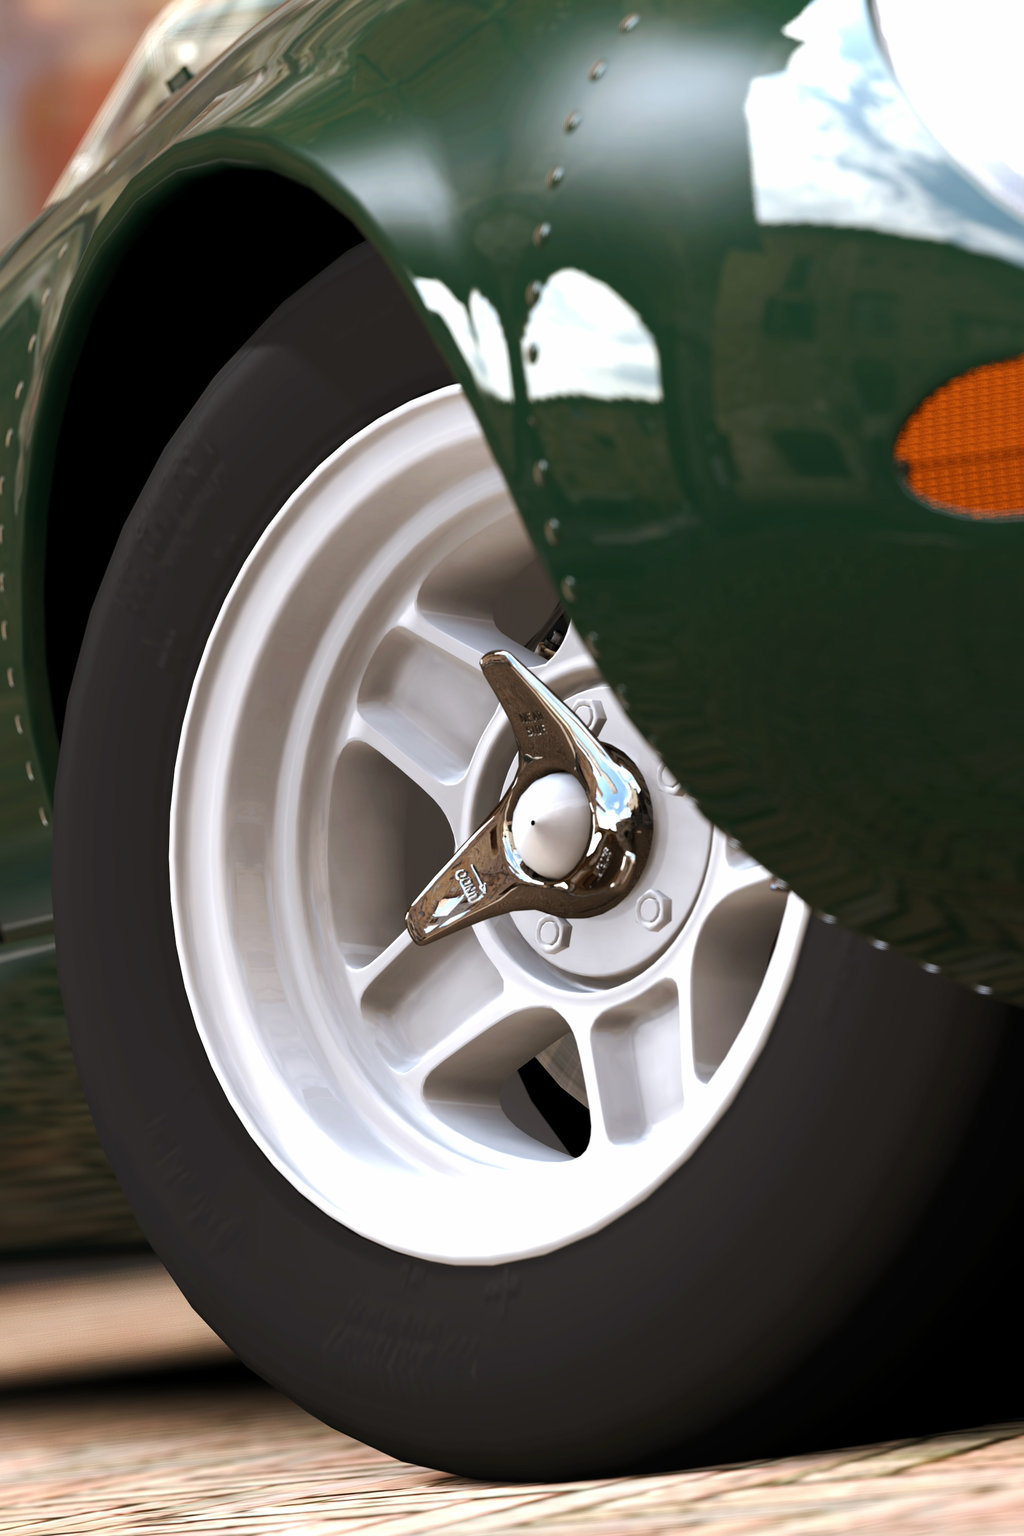 1966 Jaguar XJ13 (Gran Turismo 5) by Vertualissimo on ...